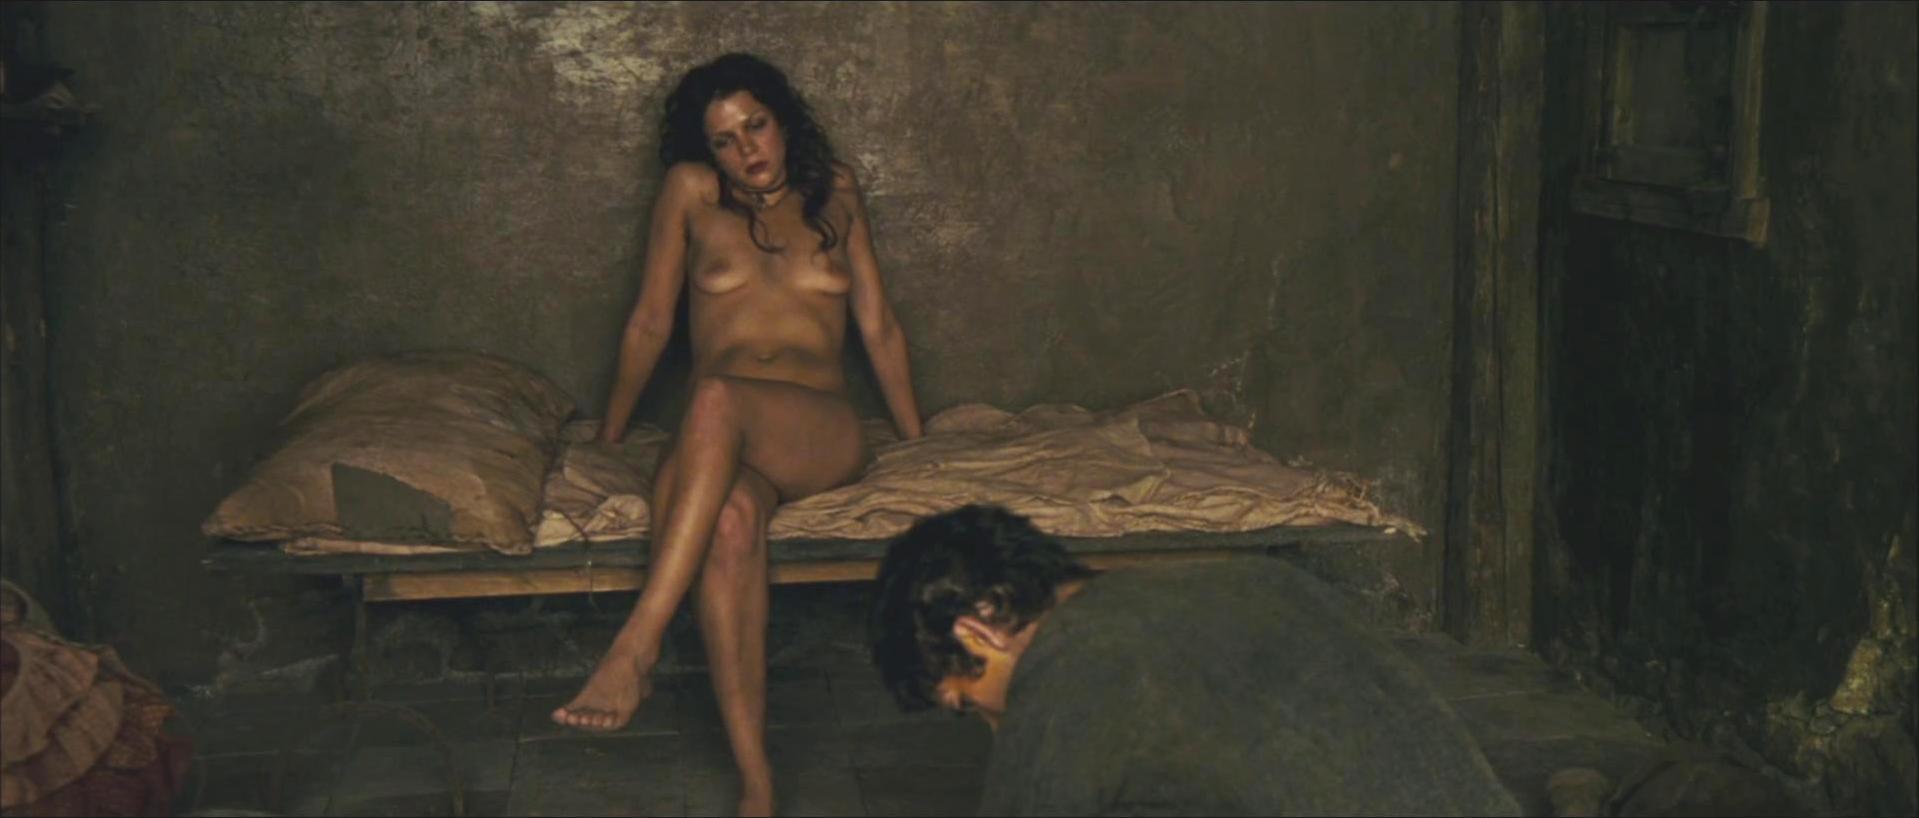 Jessica schwarz nude